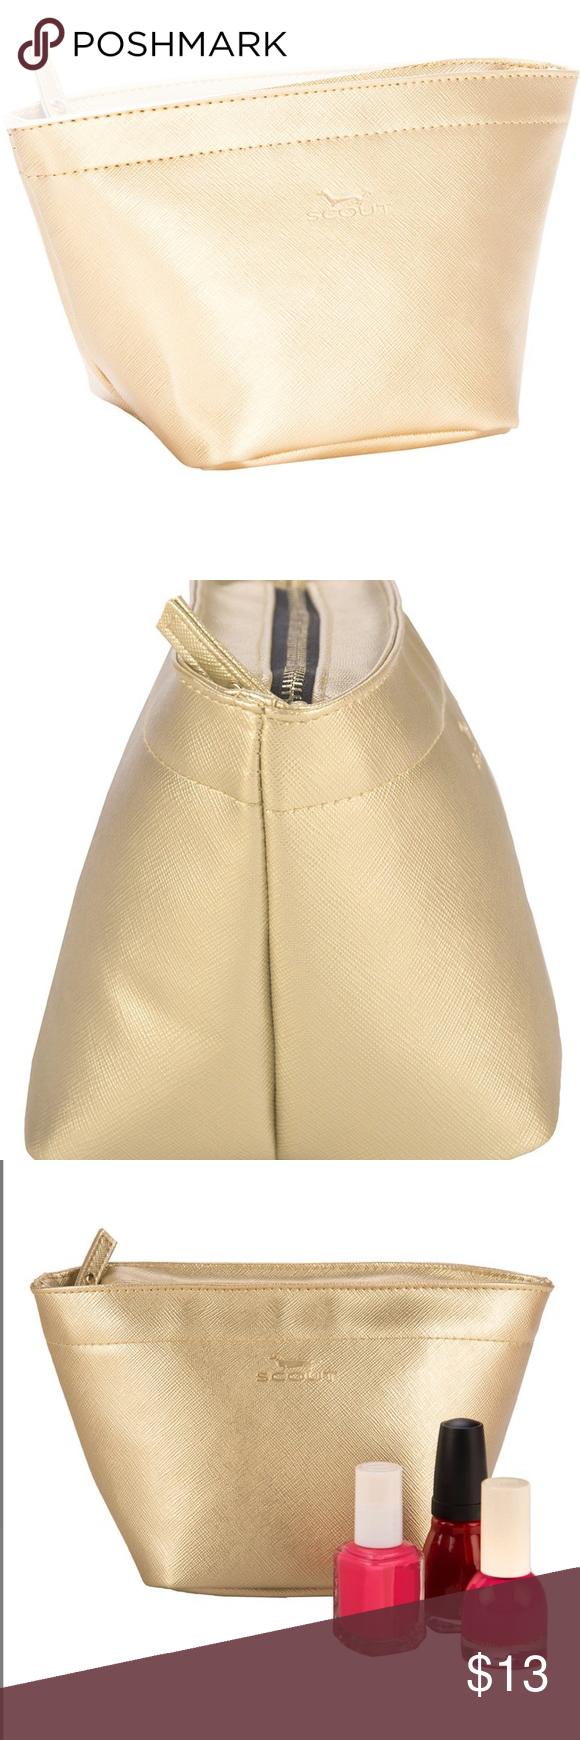 Scout Gold Crown Jewels Make up bag Boutique Silver flip